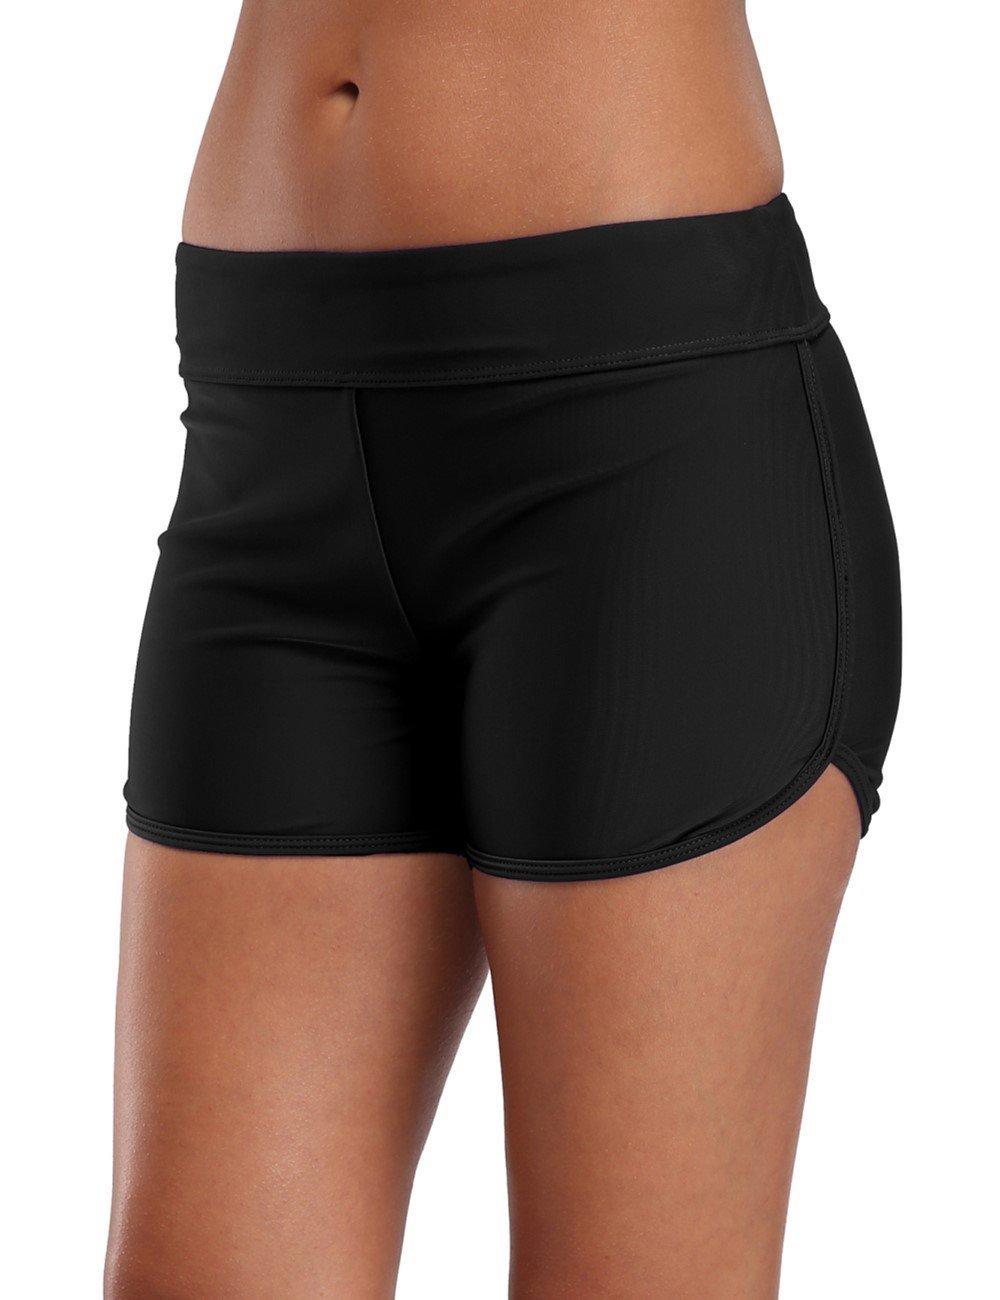 eulo Women's Swim Boyshort Tankini Swimsuit Boardshort Waistband Bikini Bottom Black M